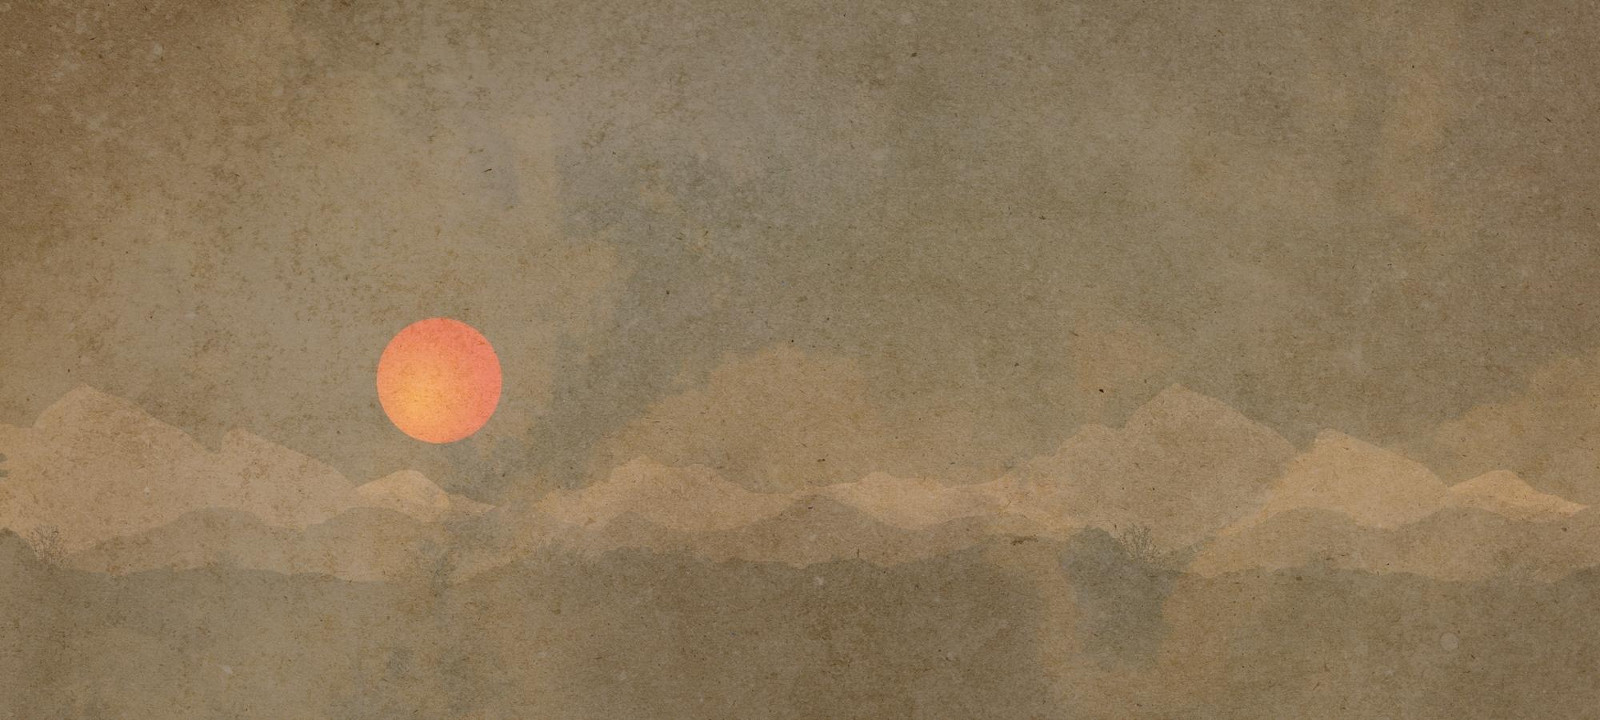 Resolving Faint Sun Paradoxes, Part 3